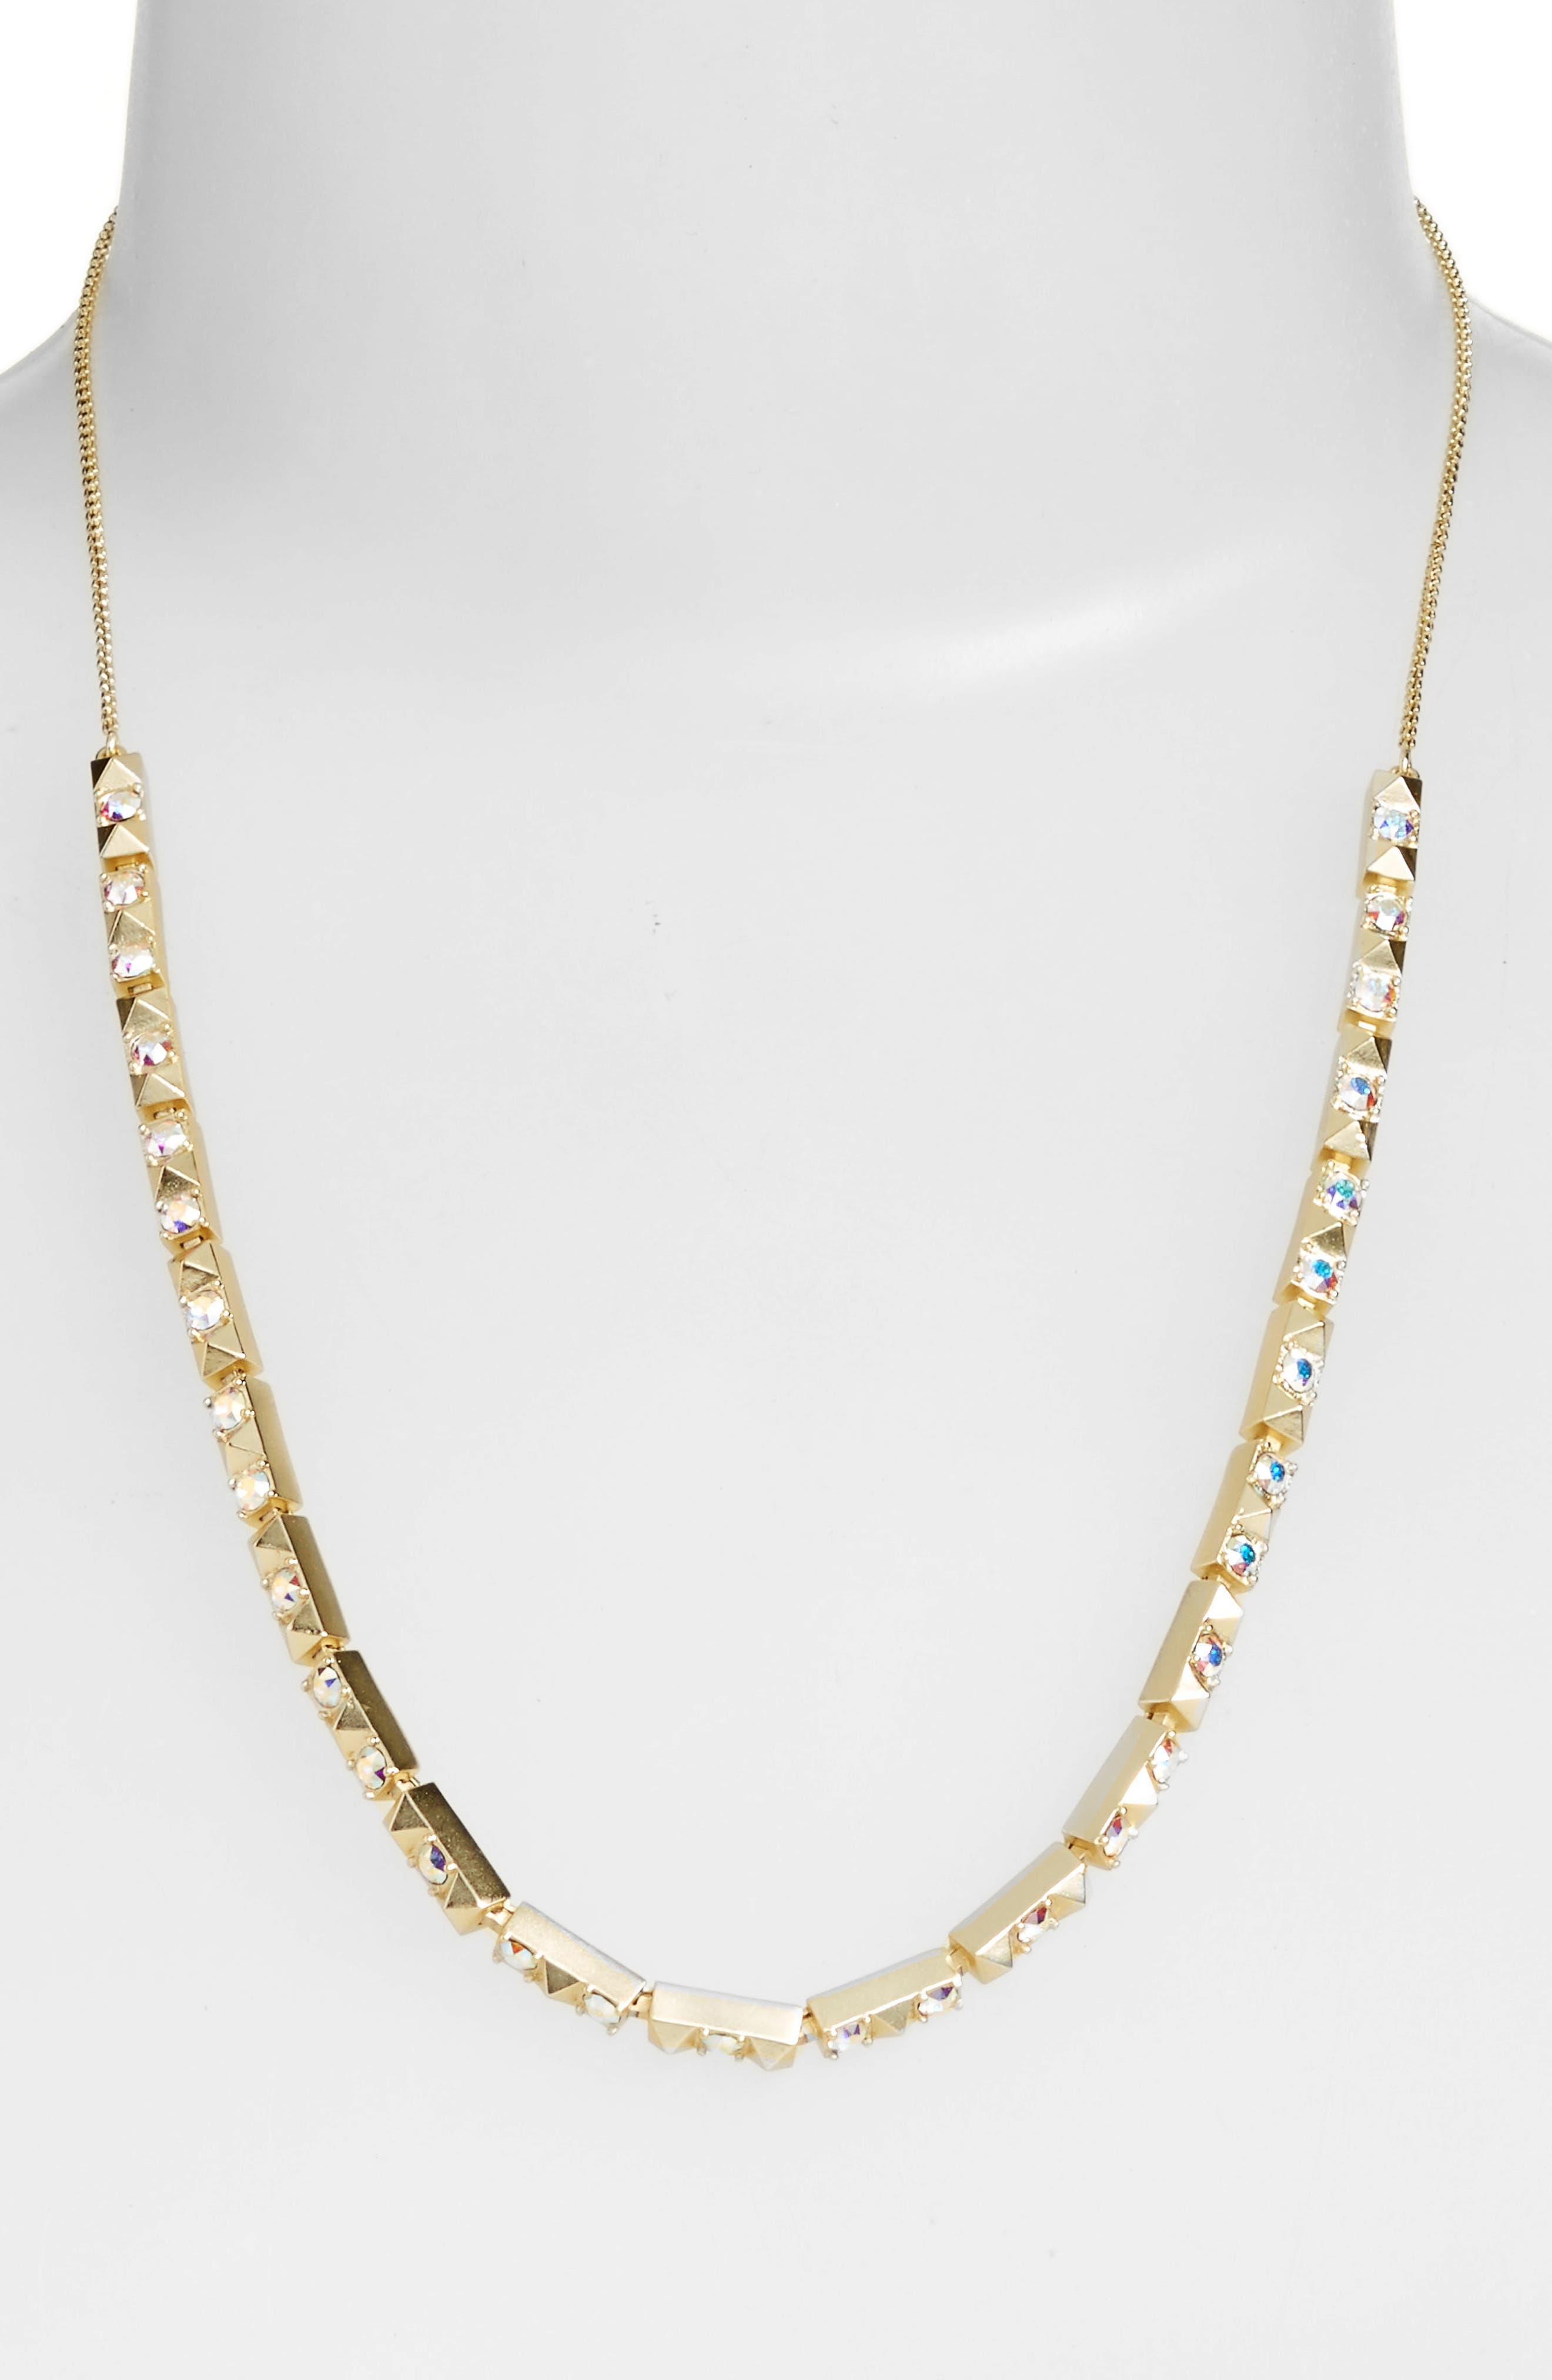 Kendra Scott Irit Adjustable Necklace